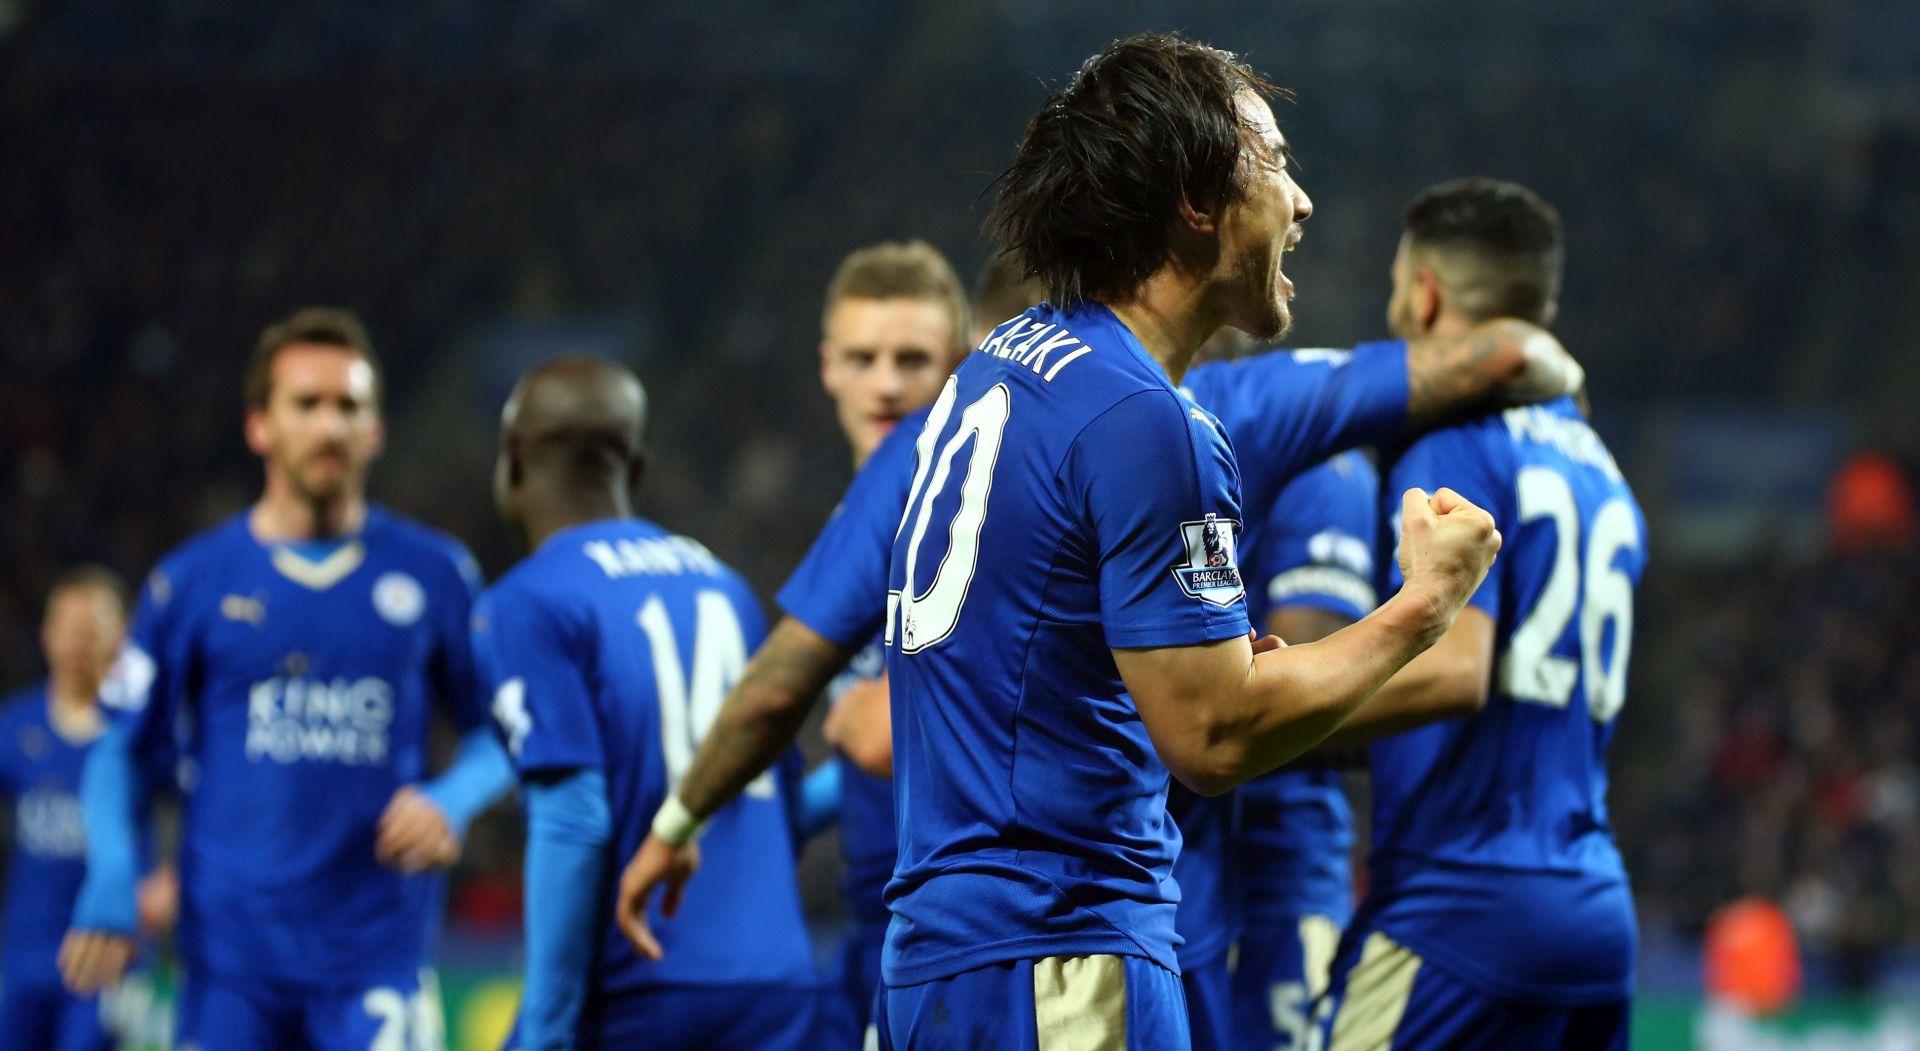 PREMIERLIGA Okazaki pogodio za povećanje Leicesterove prednosti